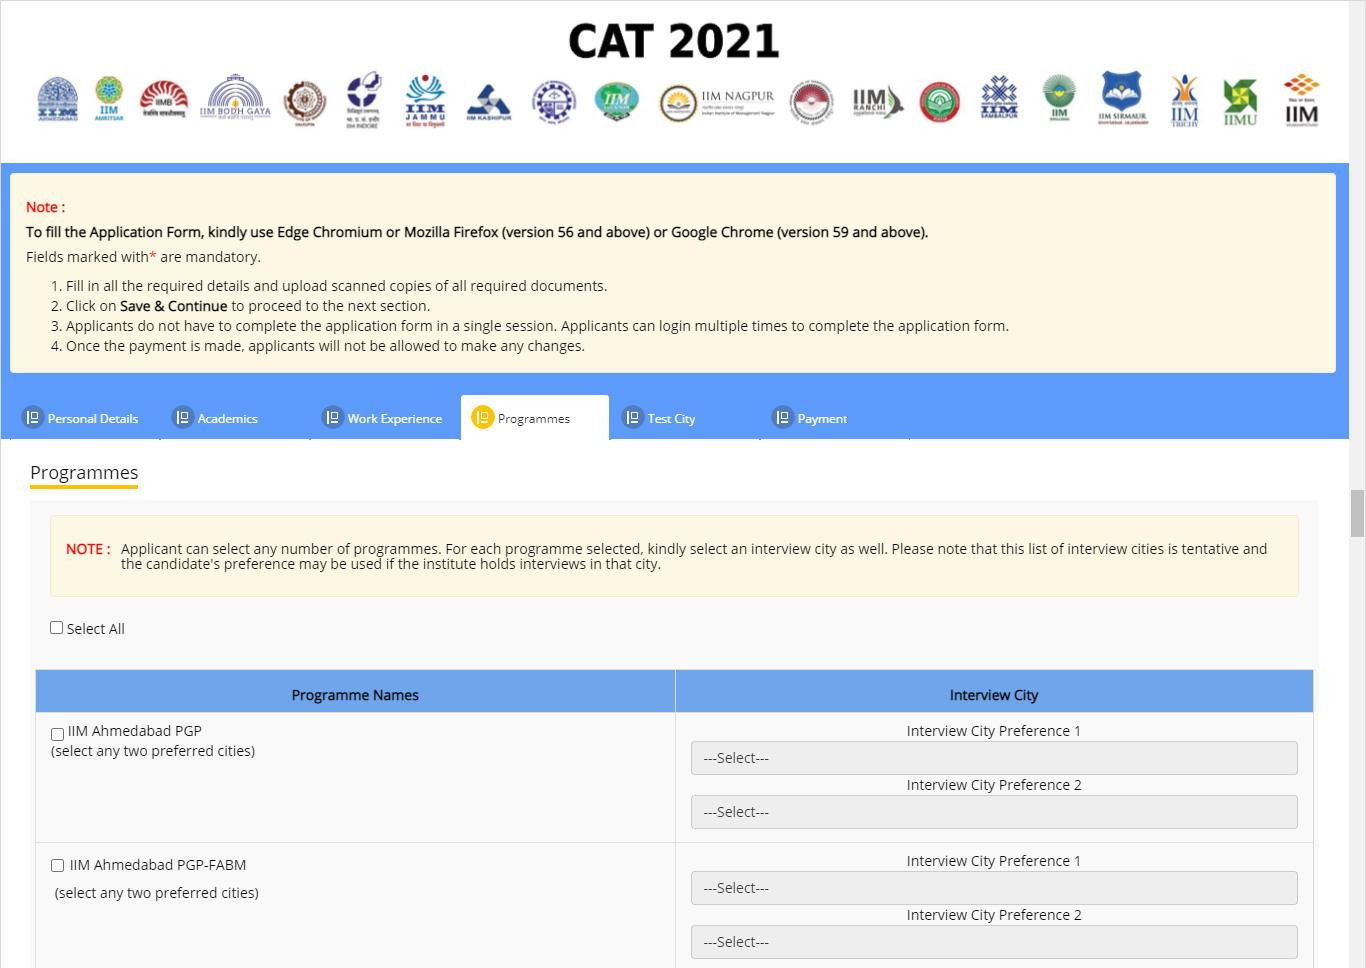 CAT Programmes